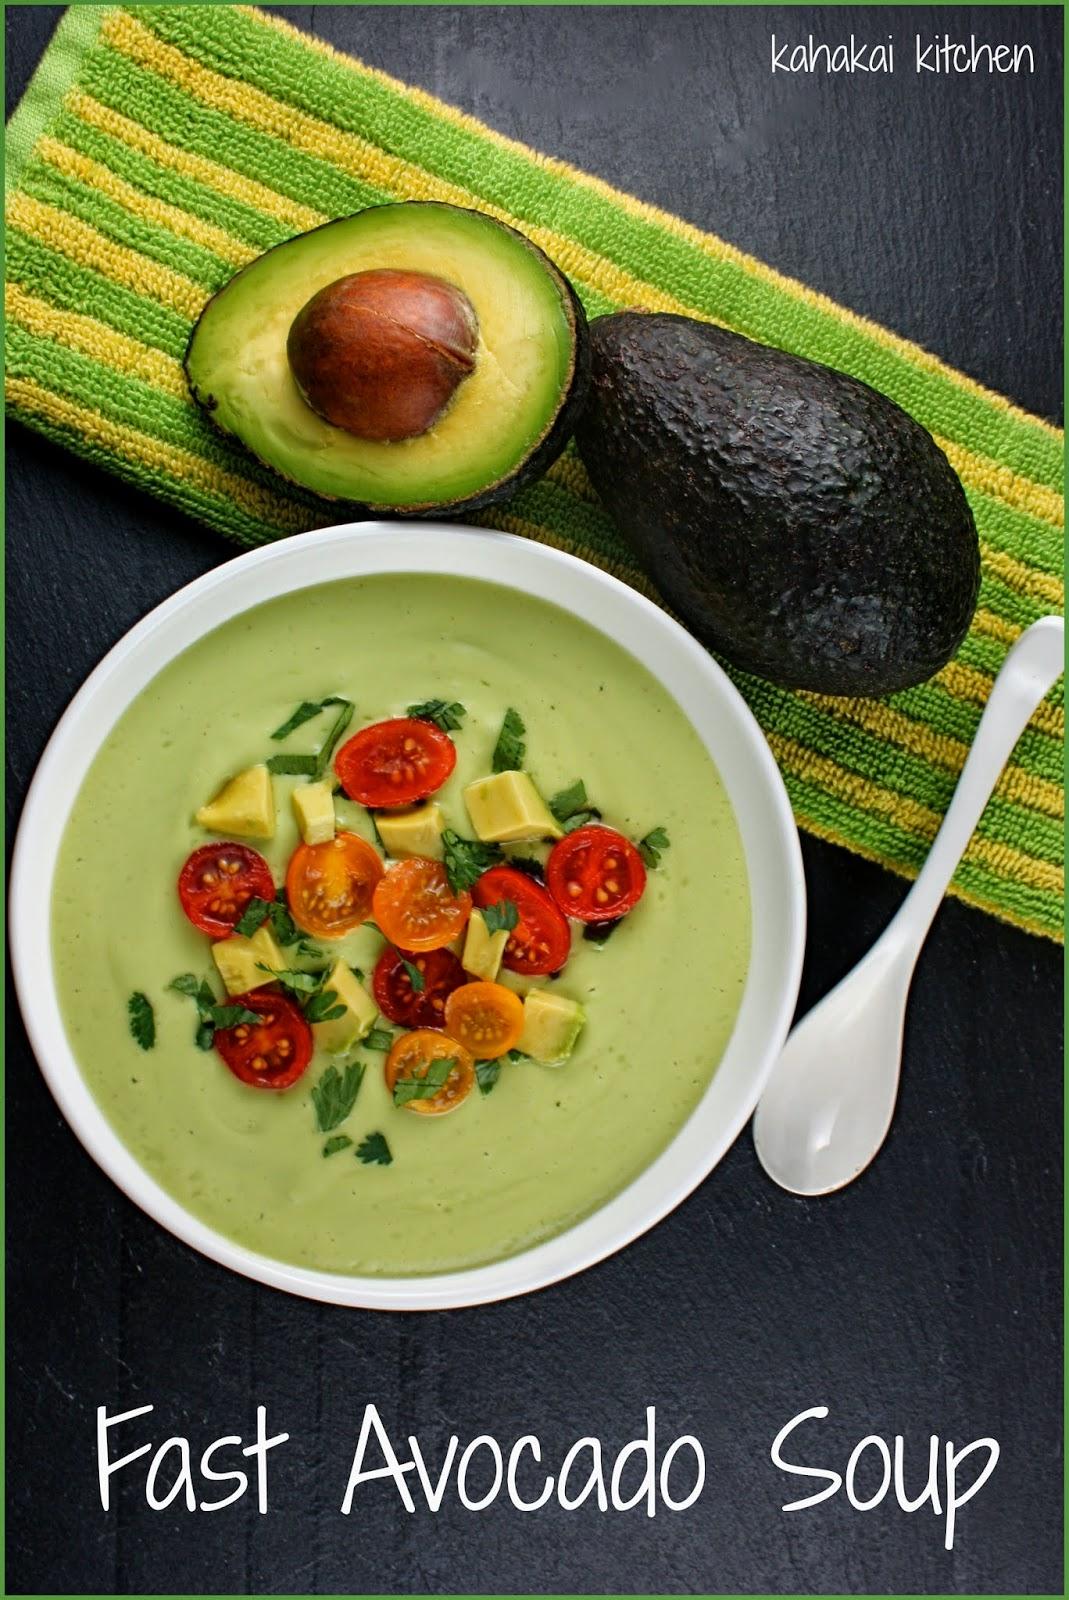 Chilled California Avocado Soup With Coconut Milk Recipes — Dishmaps